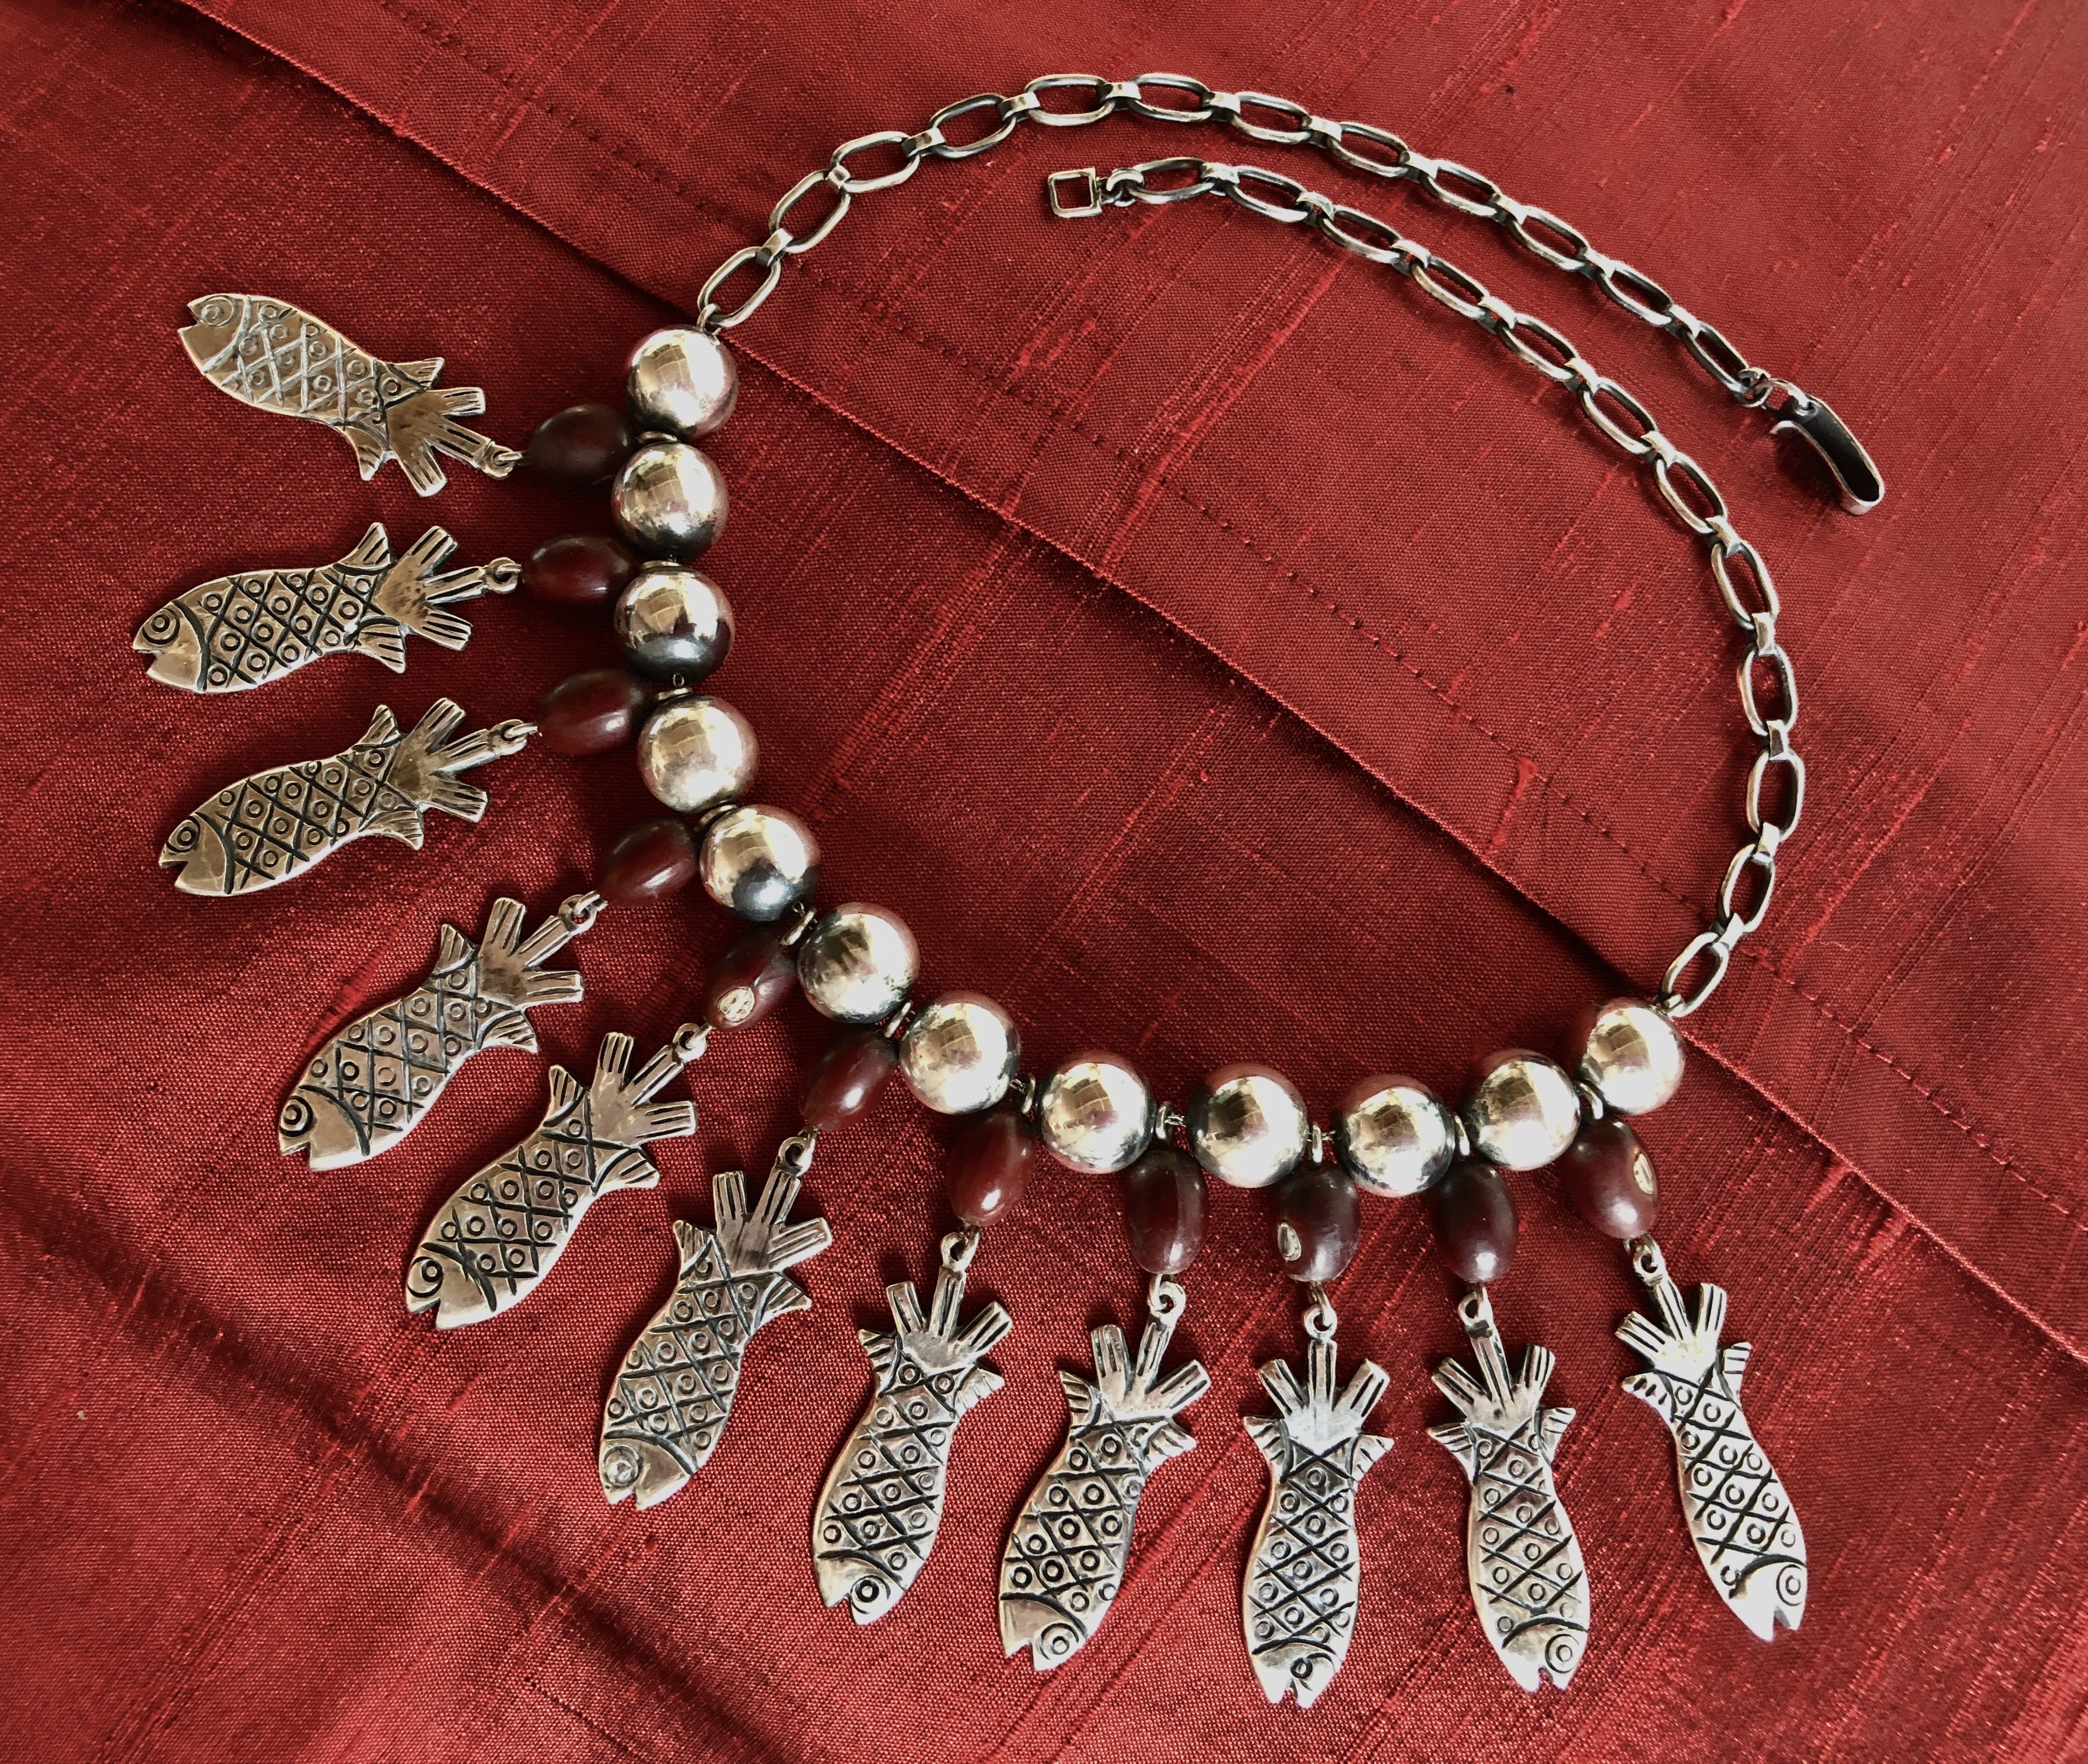 Vintage Necklace Trends